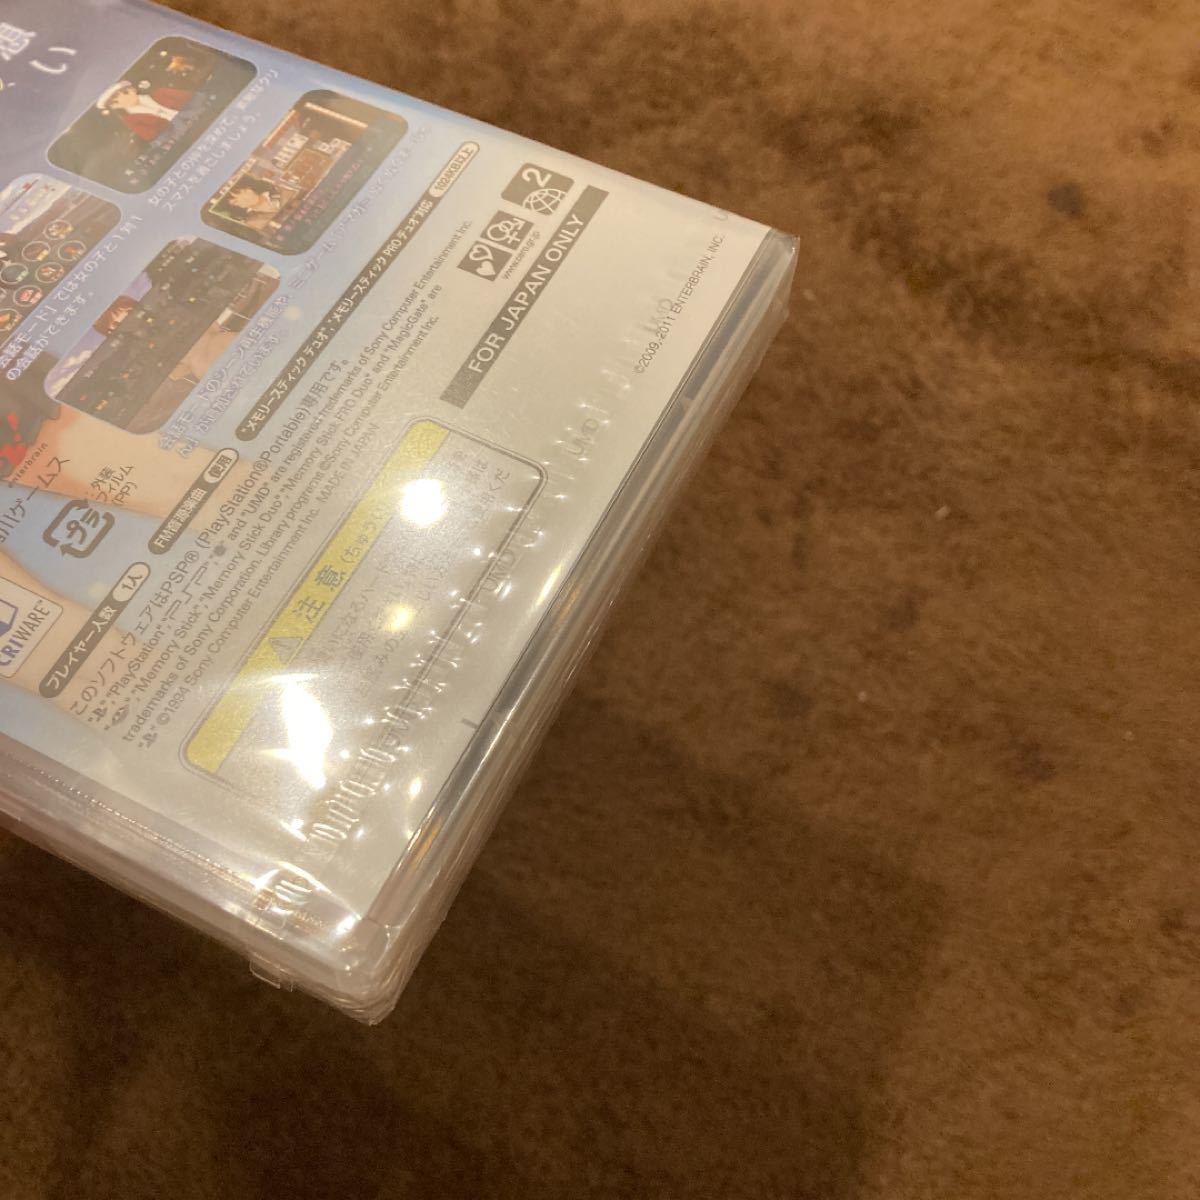 PSP ソフト  アマガミ PSPソフト エビコレ PSP PS4